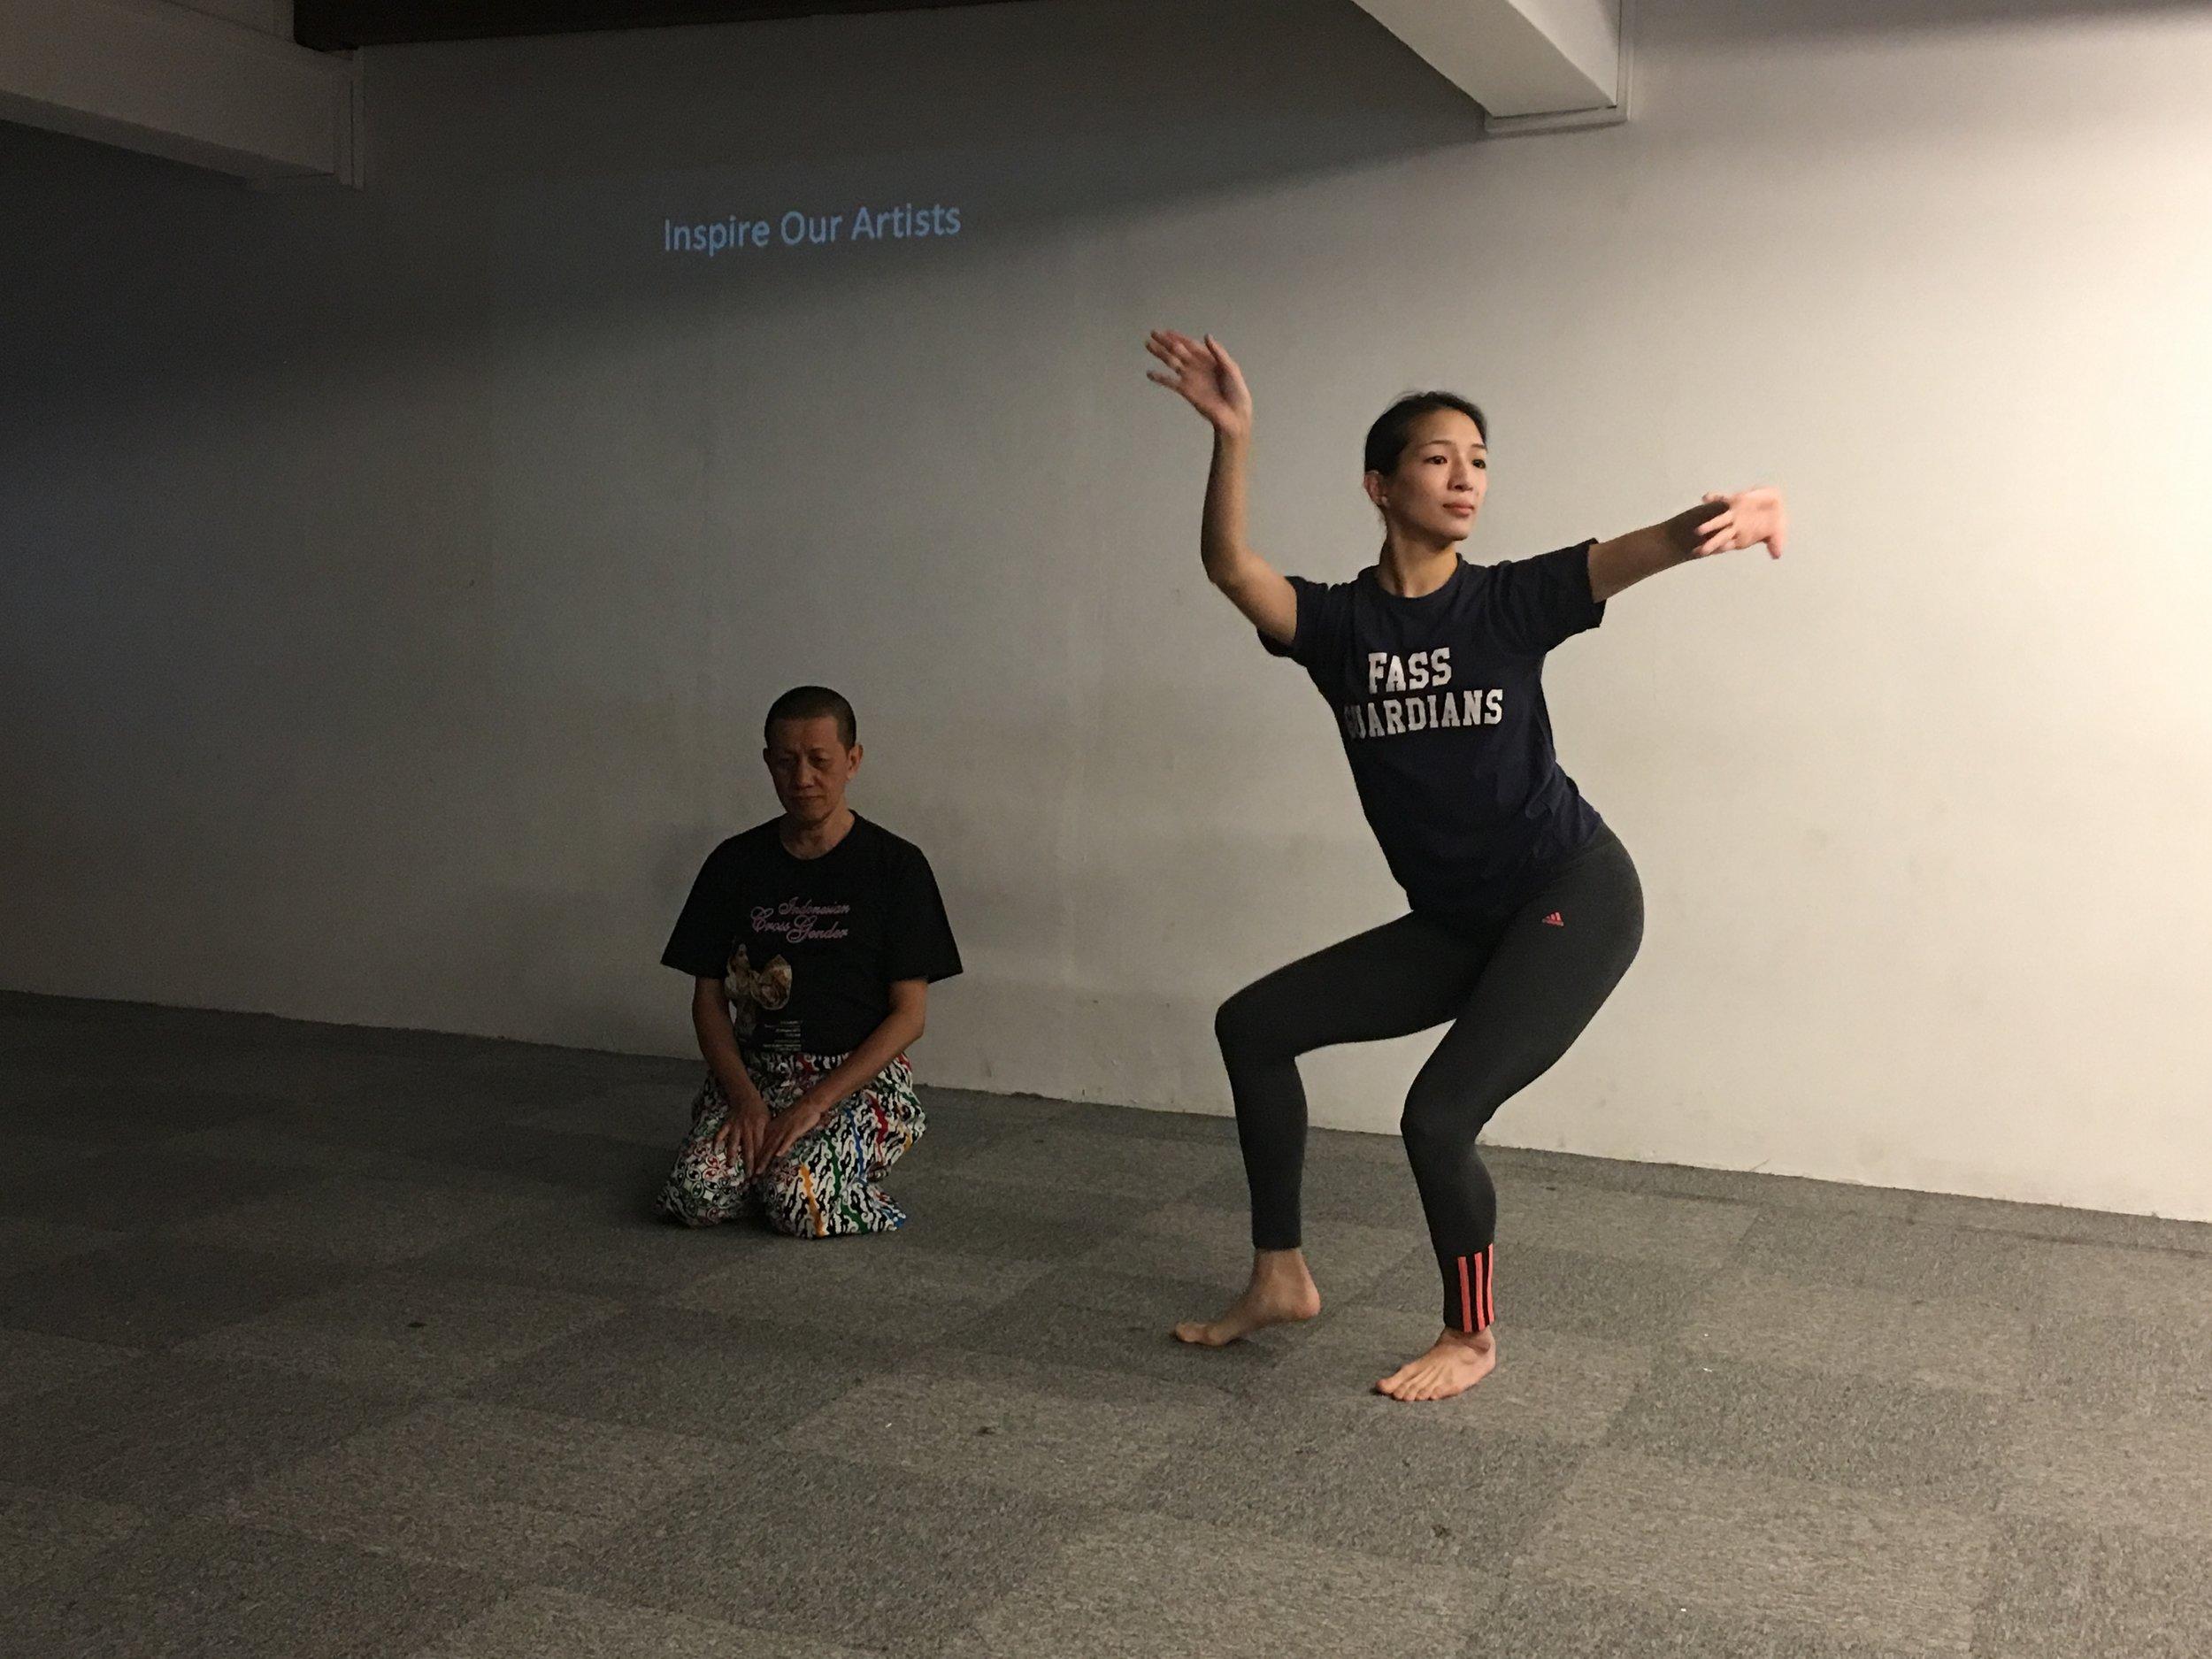 Chinese dance practitioner Elizabeth Chan (standing) with one of the pioneers of classical cross-gender Javanese dance, Didik Nini Thowok.